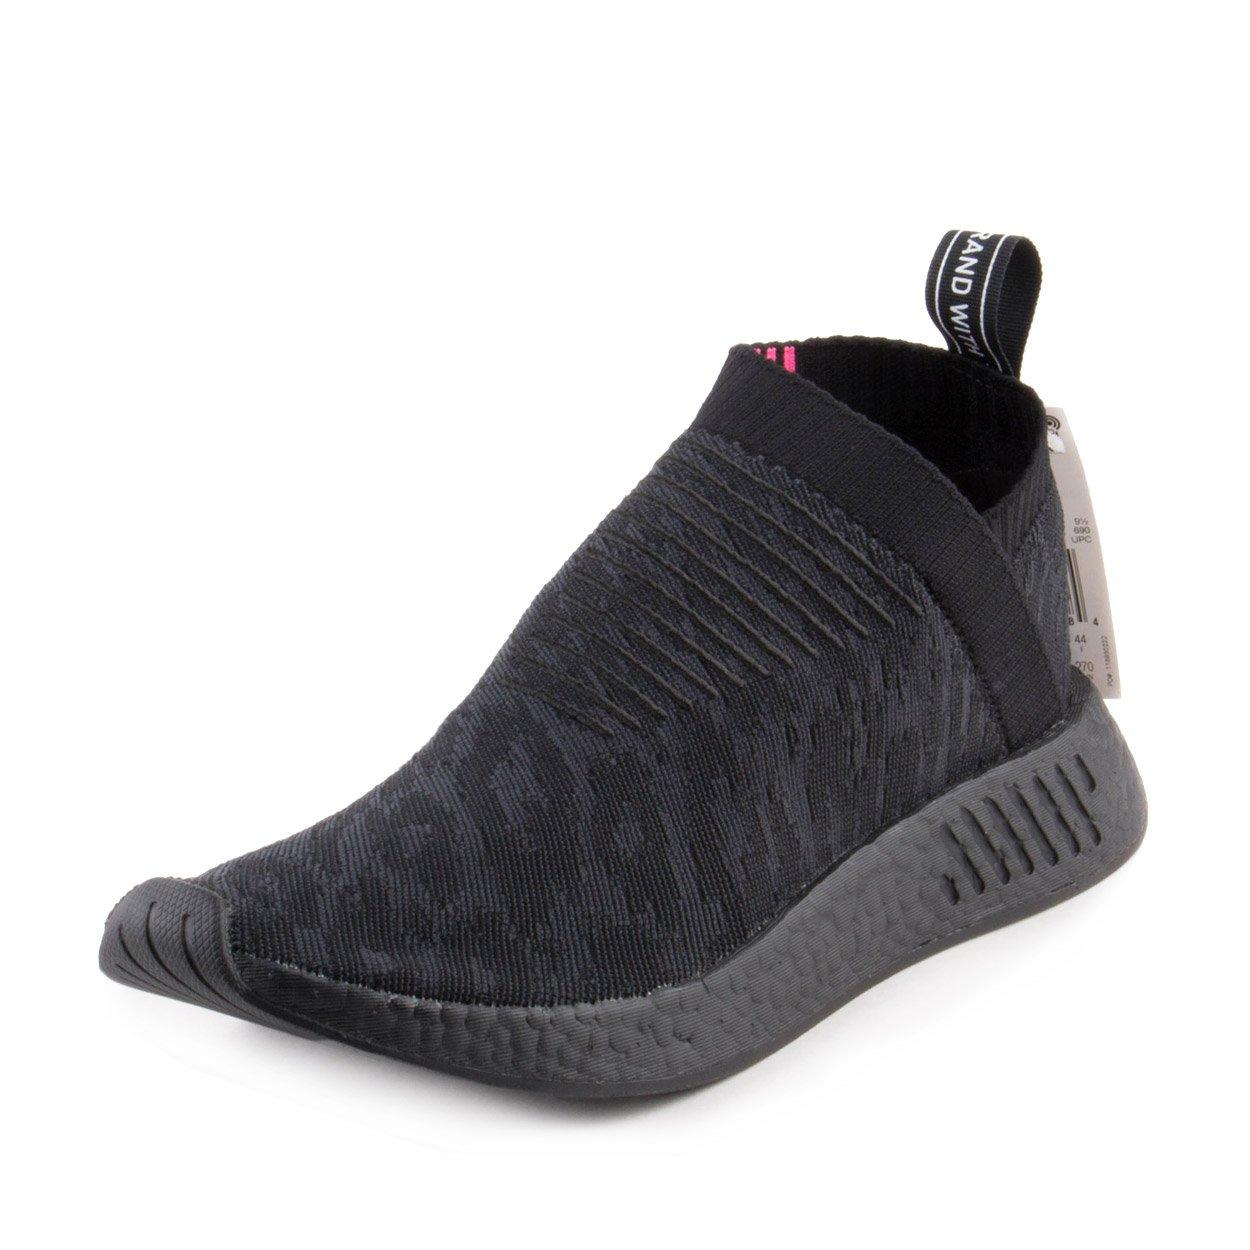 7575f509d Galleon - Adidas NMD CS2 PK Core Black Core Black Core Black Shoes CQ2373  For Men (7.5)